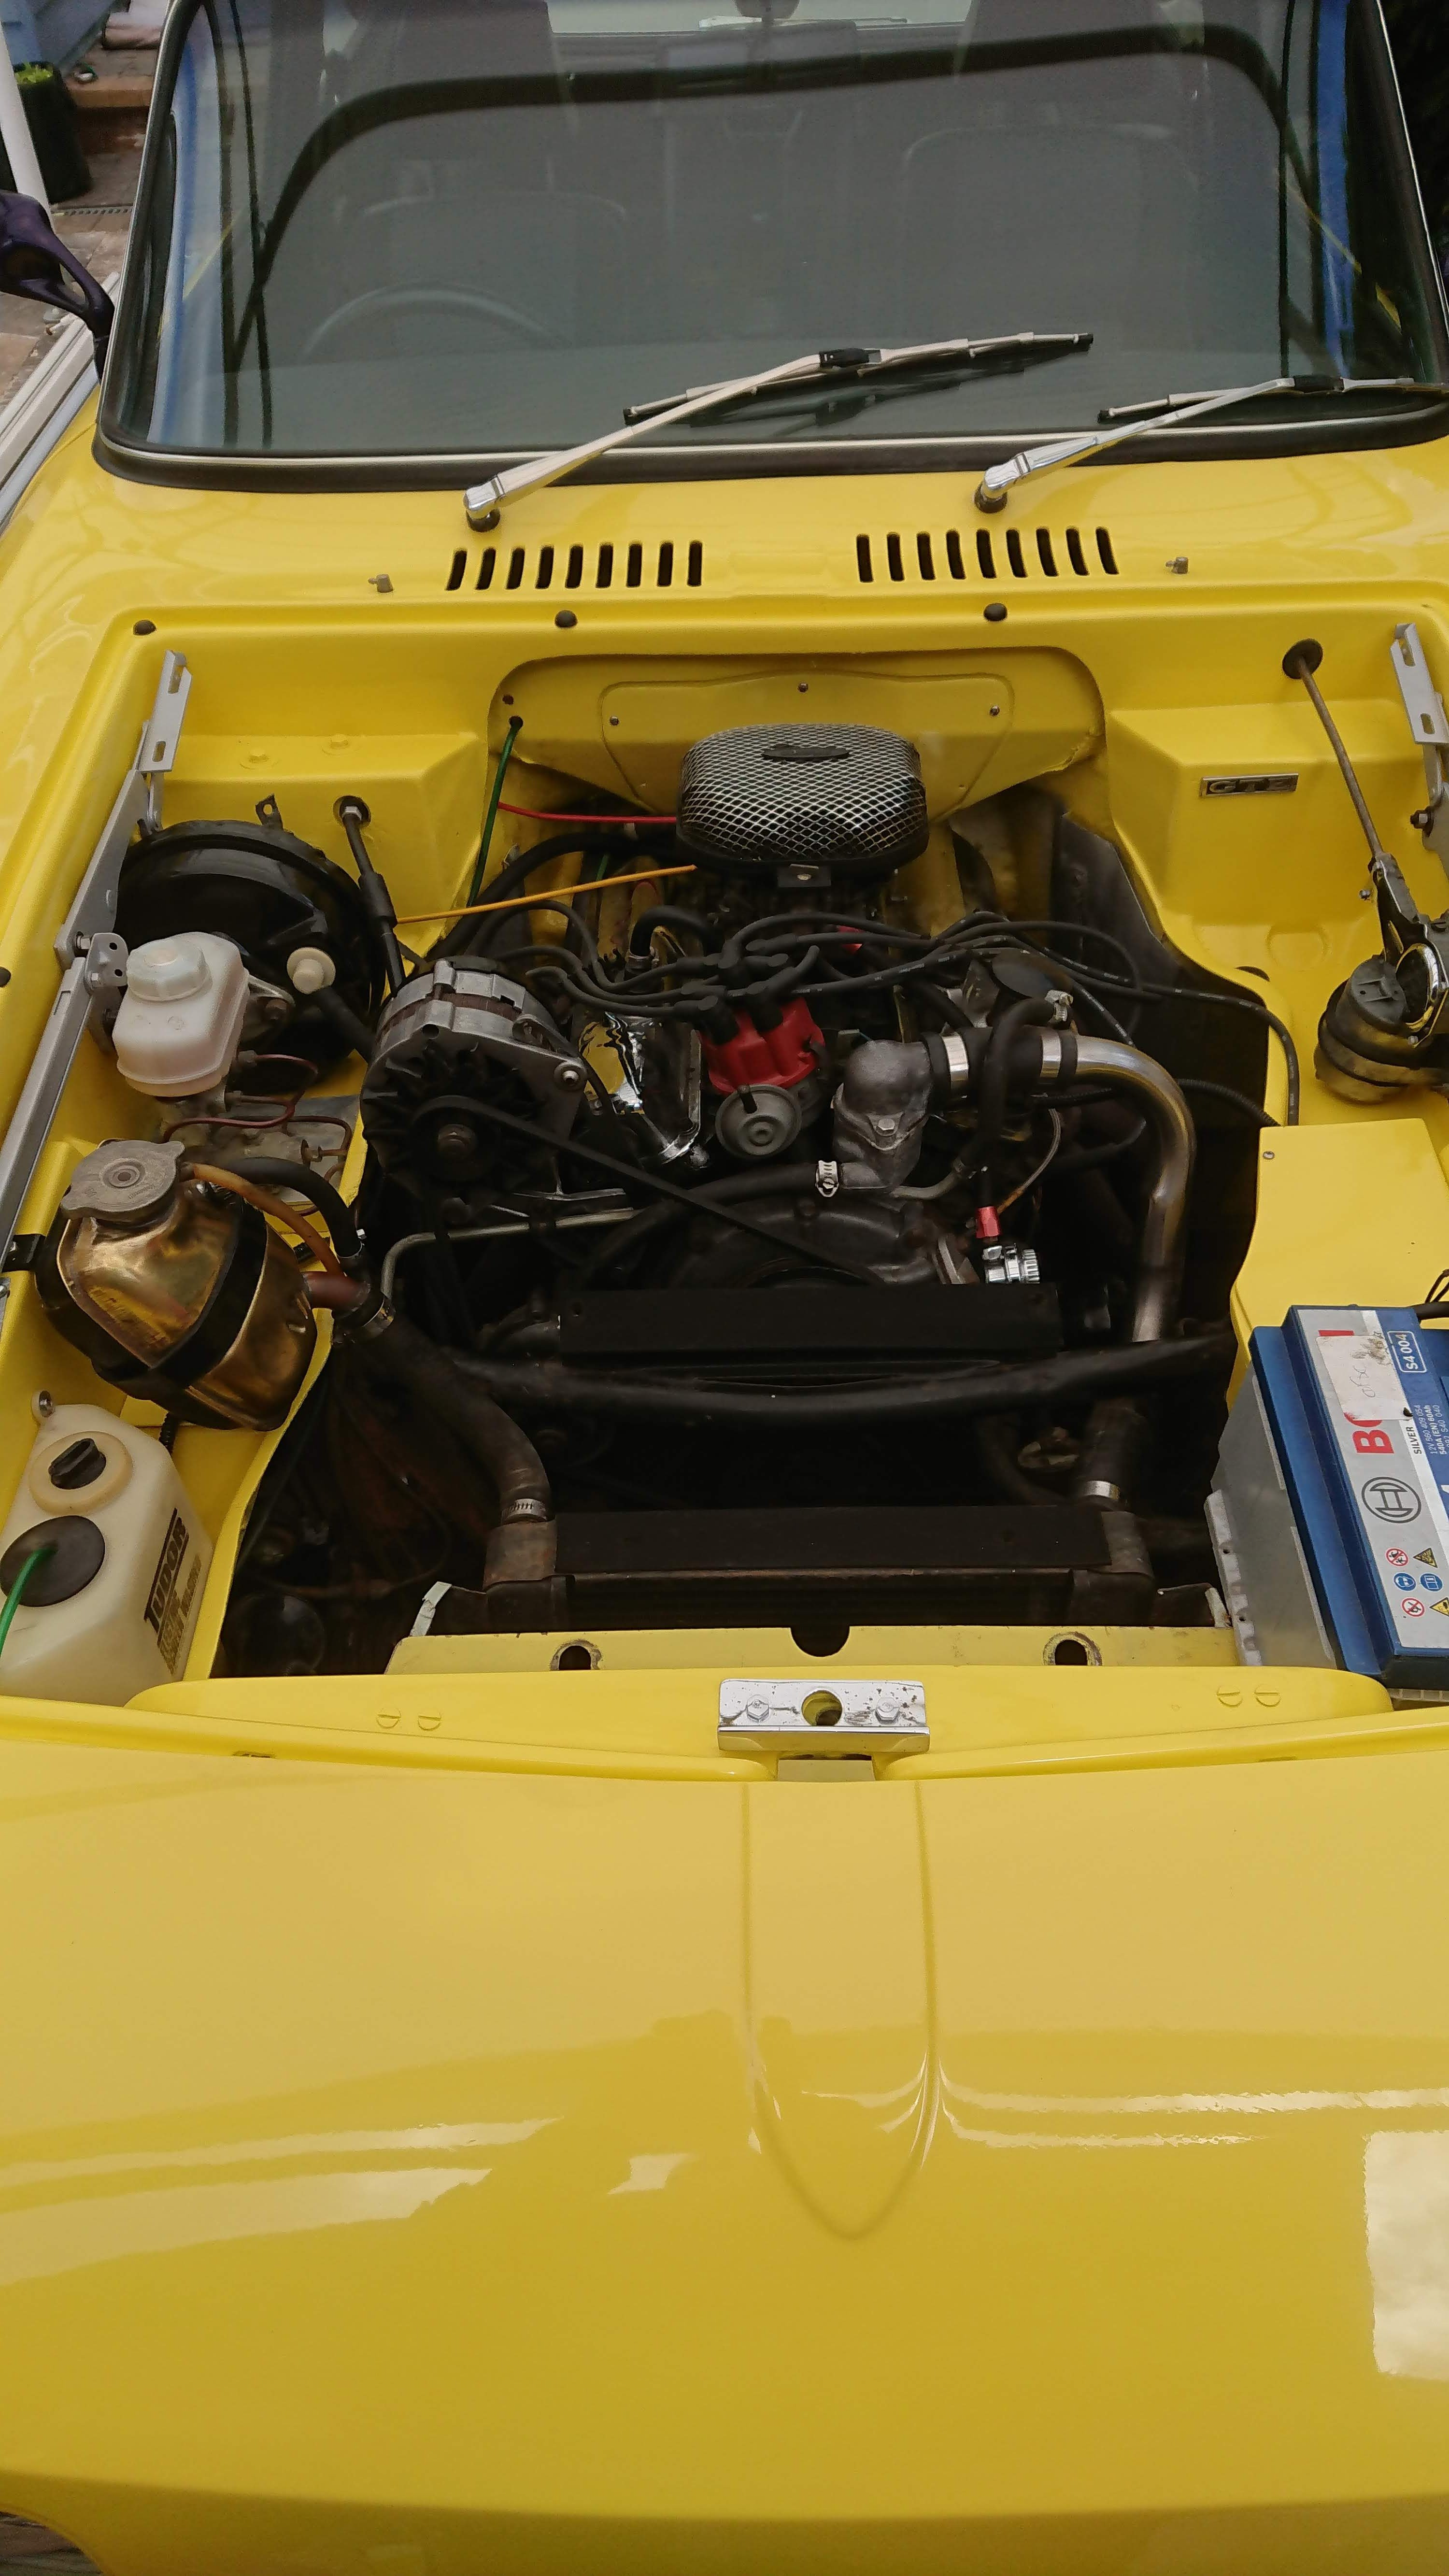 1975 Reliant Scimitar se 5 a For Sale (picture 6 of 6)